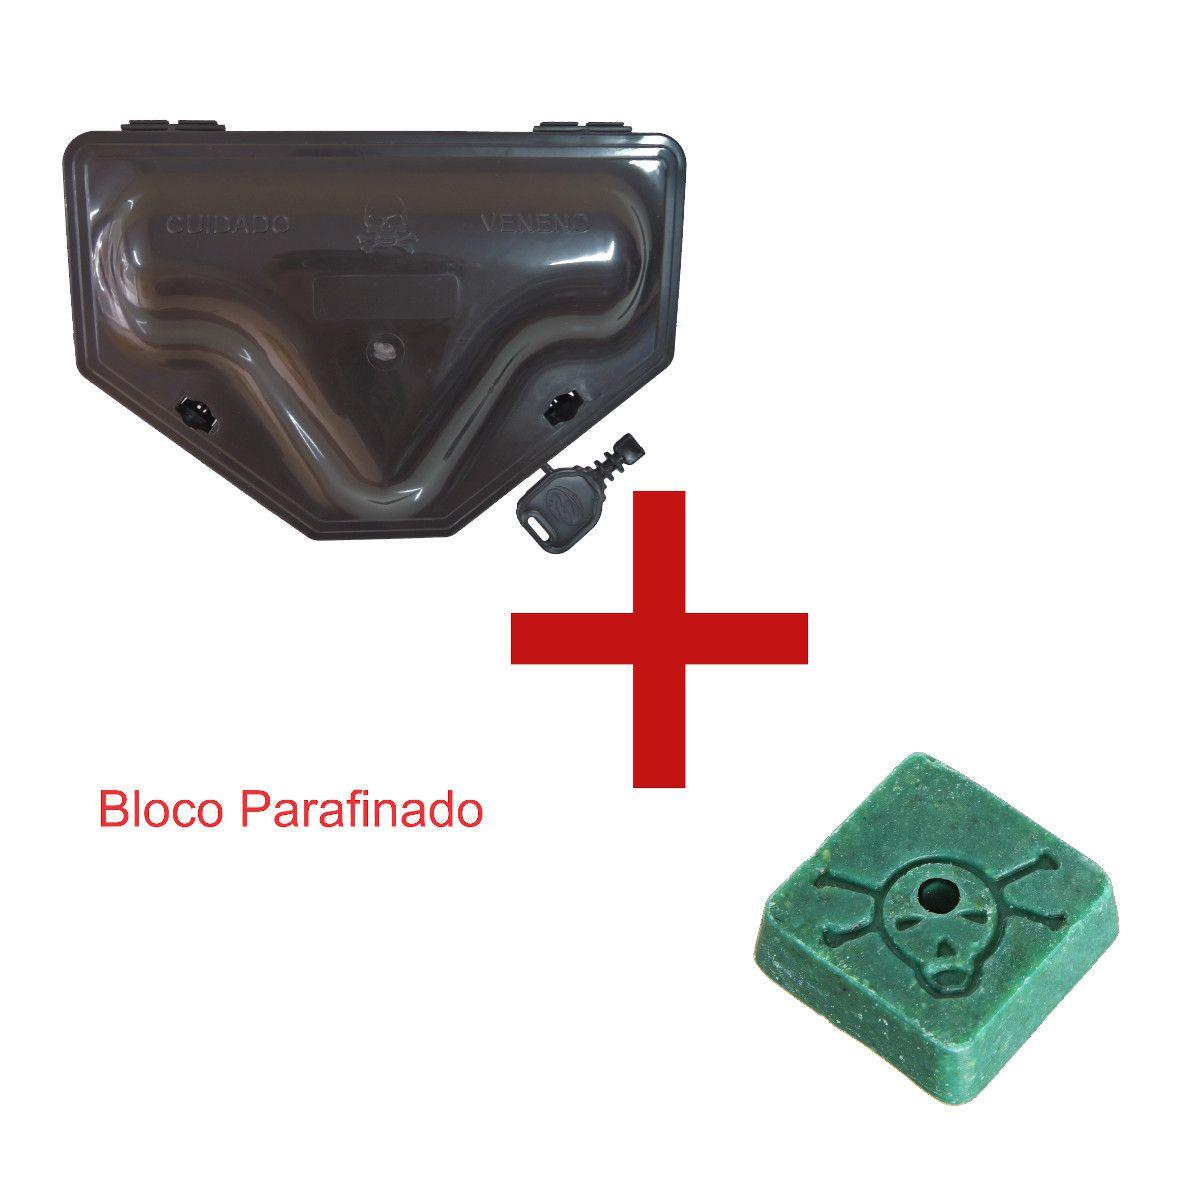 KIT 8 Porta Iscas Armadilha Pega Ratos 2 TRAVAS c/ Chave